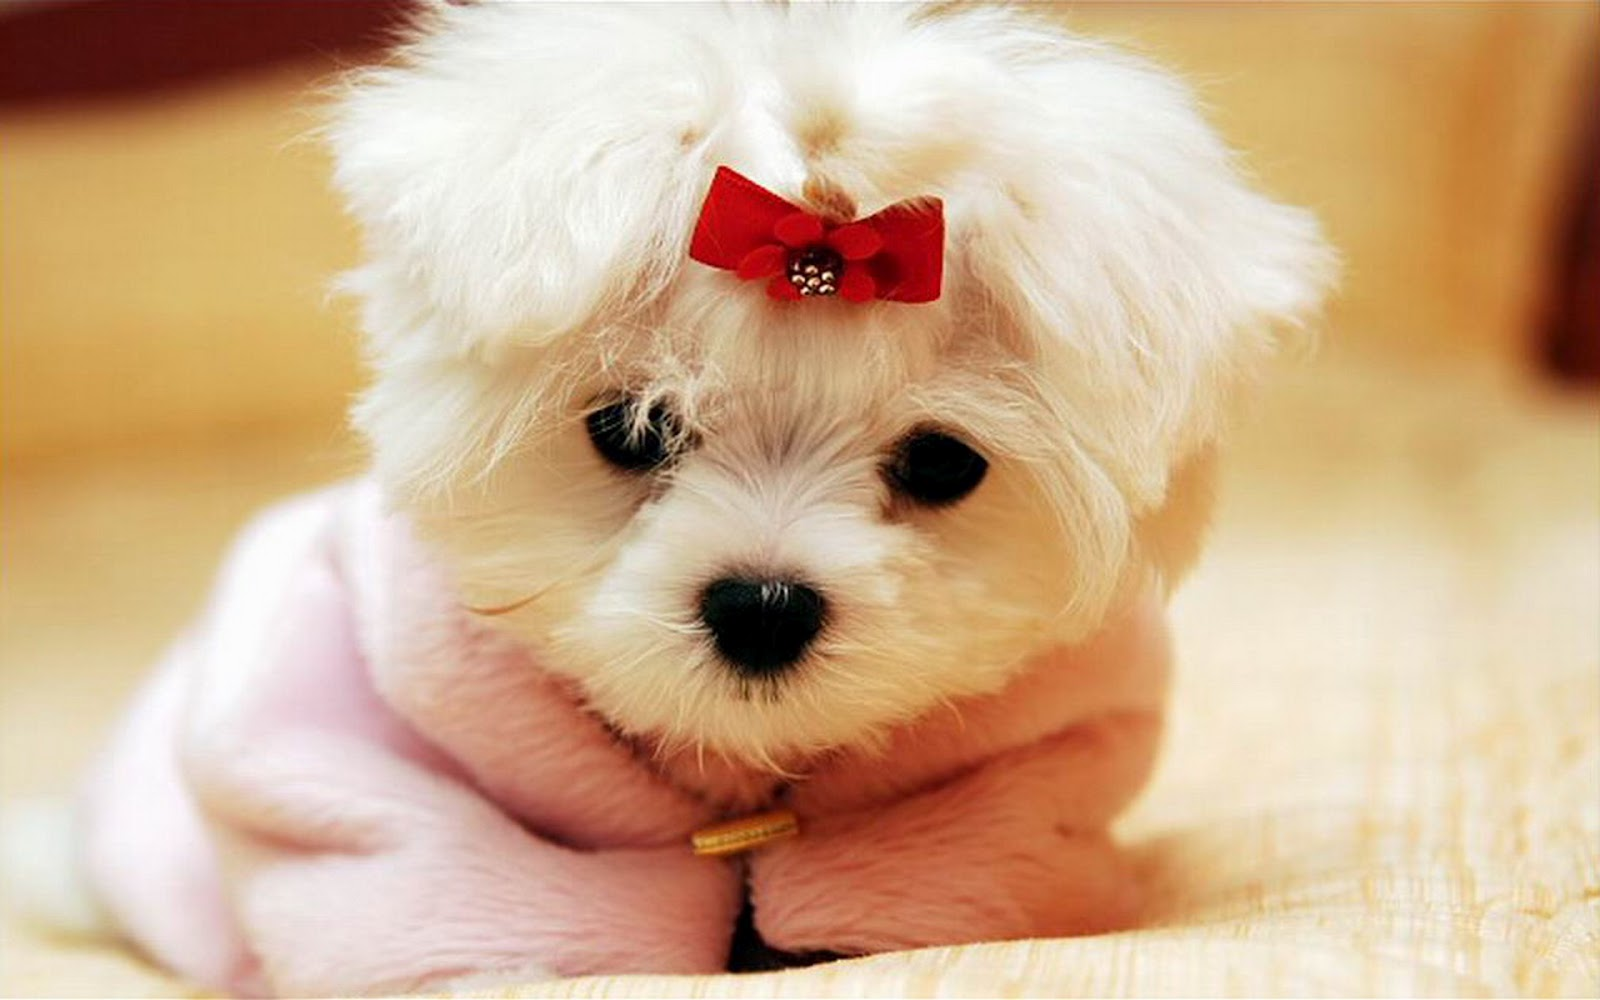 http://2.bp.blogspot.com/-ydxdFHN0lIo/UAv-MWz-KGI/AAAAAAAAK6o/PNORgK2F6fc/s1600/Puppy+13.jpg